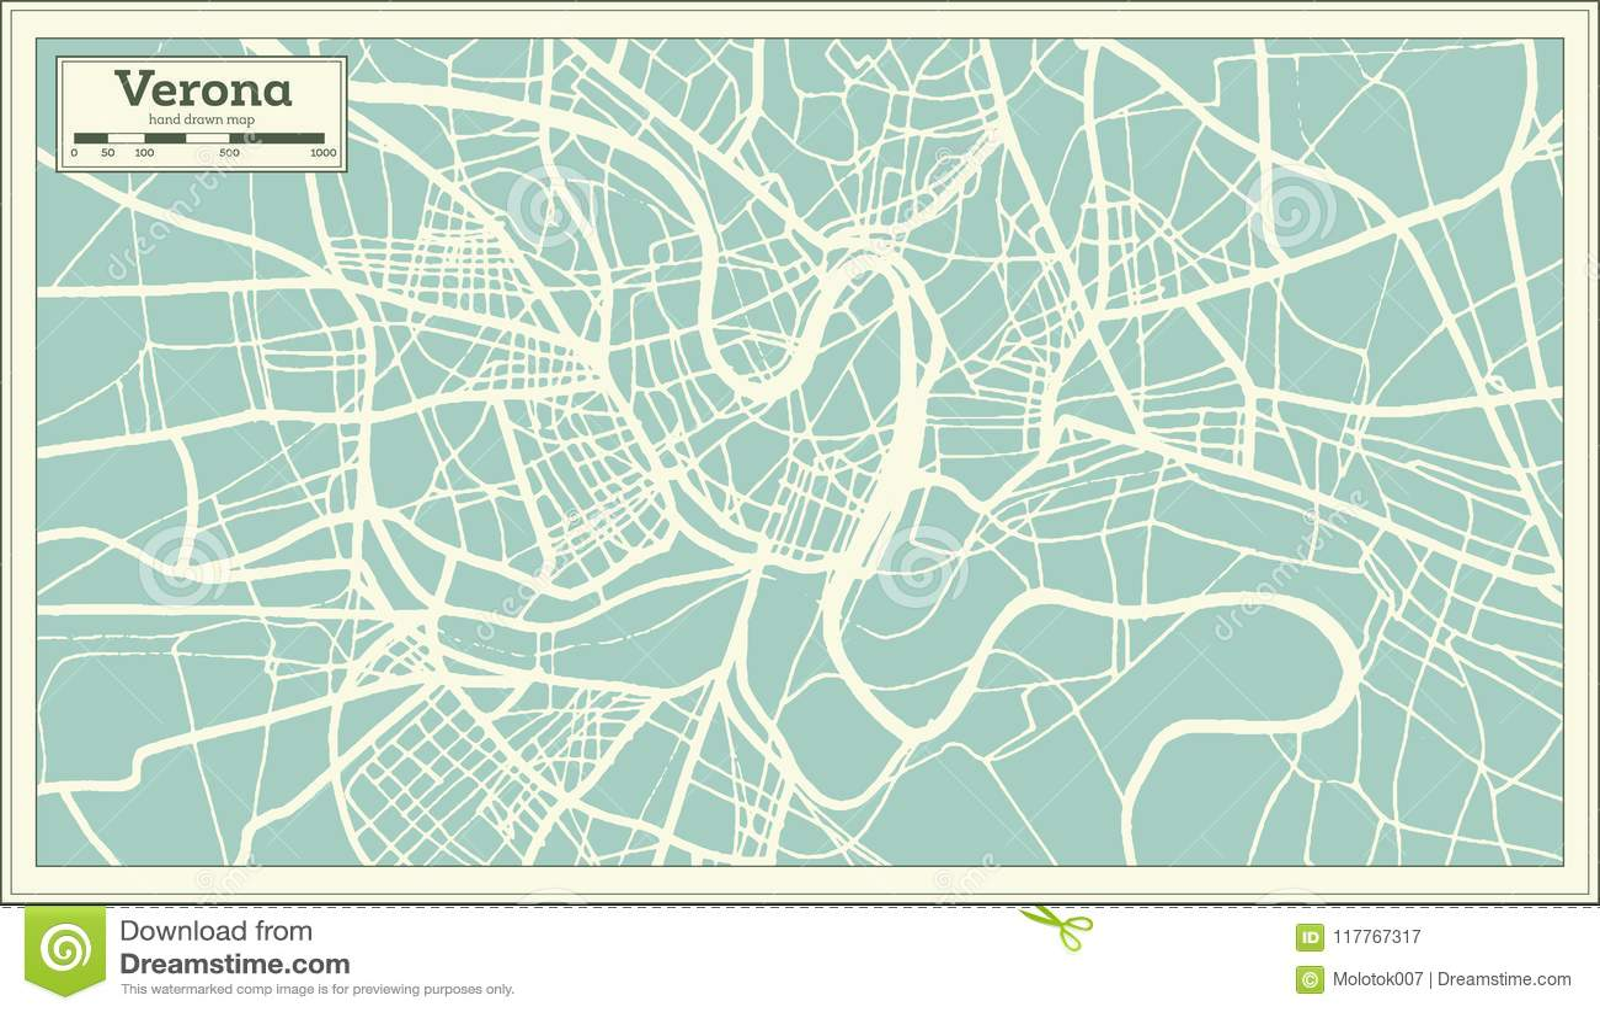 Verona Italy City Map In Retro Style Stock Vector Illustration Of